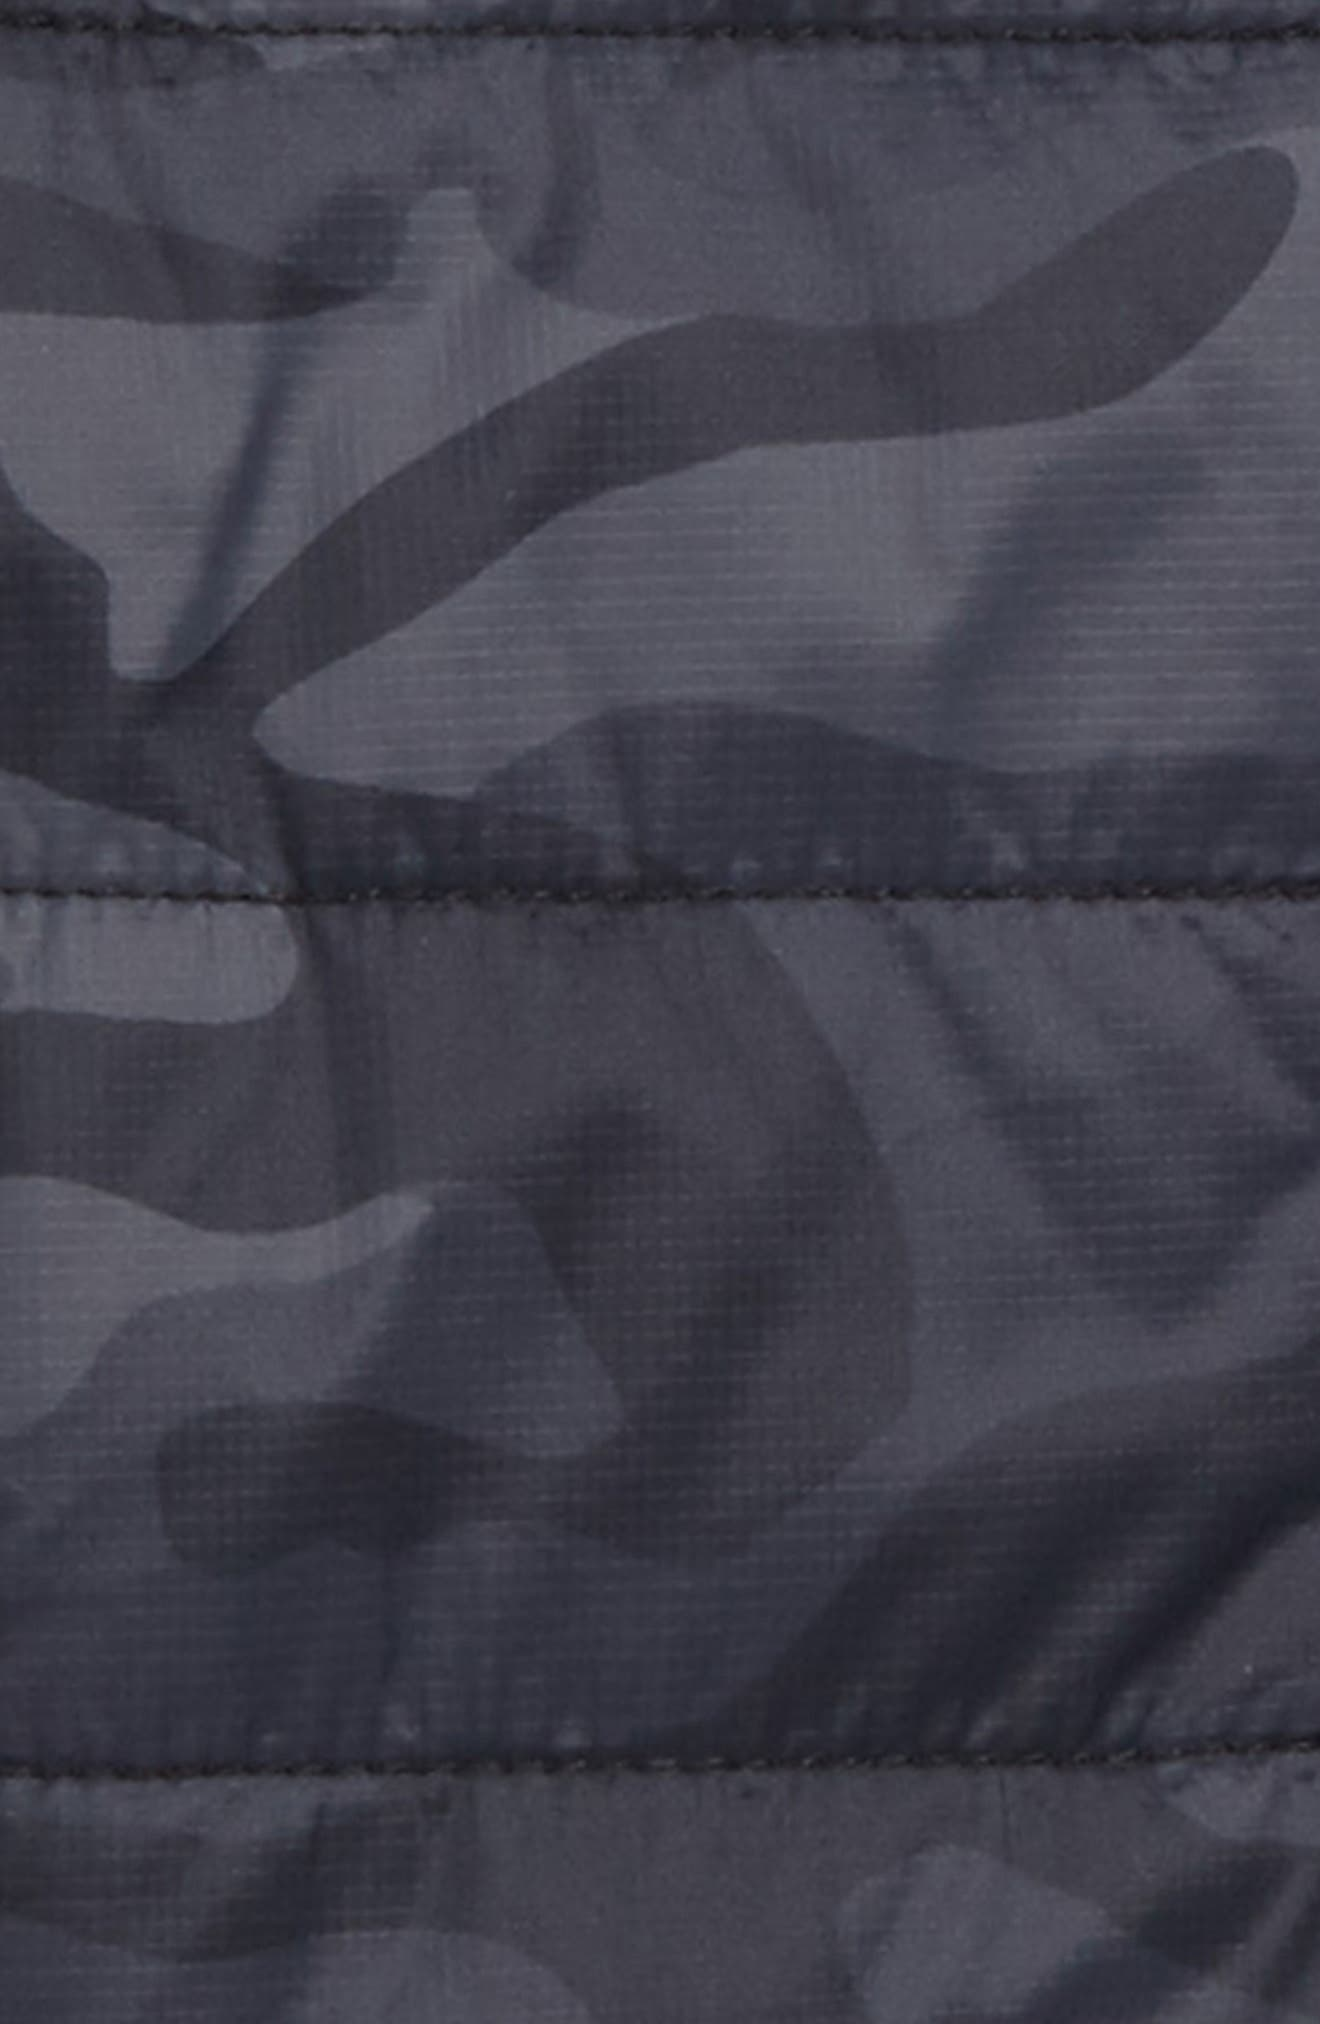 Reversible Mountain Weekend Jacket,                             Alternate thumbnail 3, color,                             Jet Black